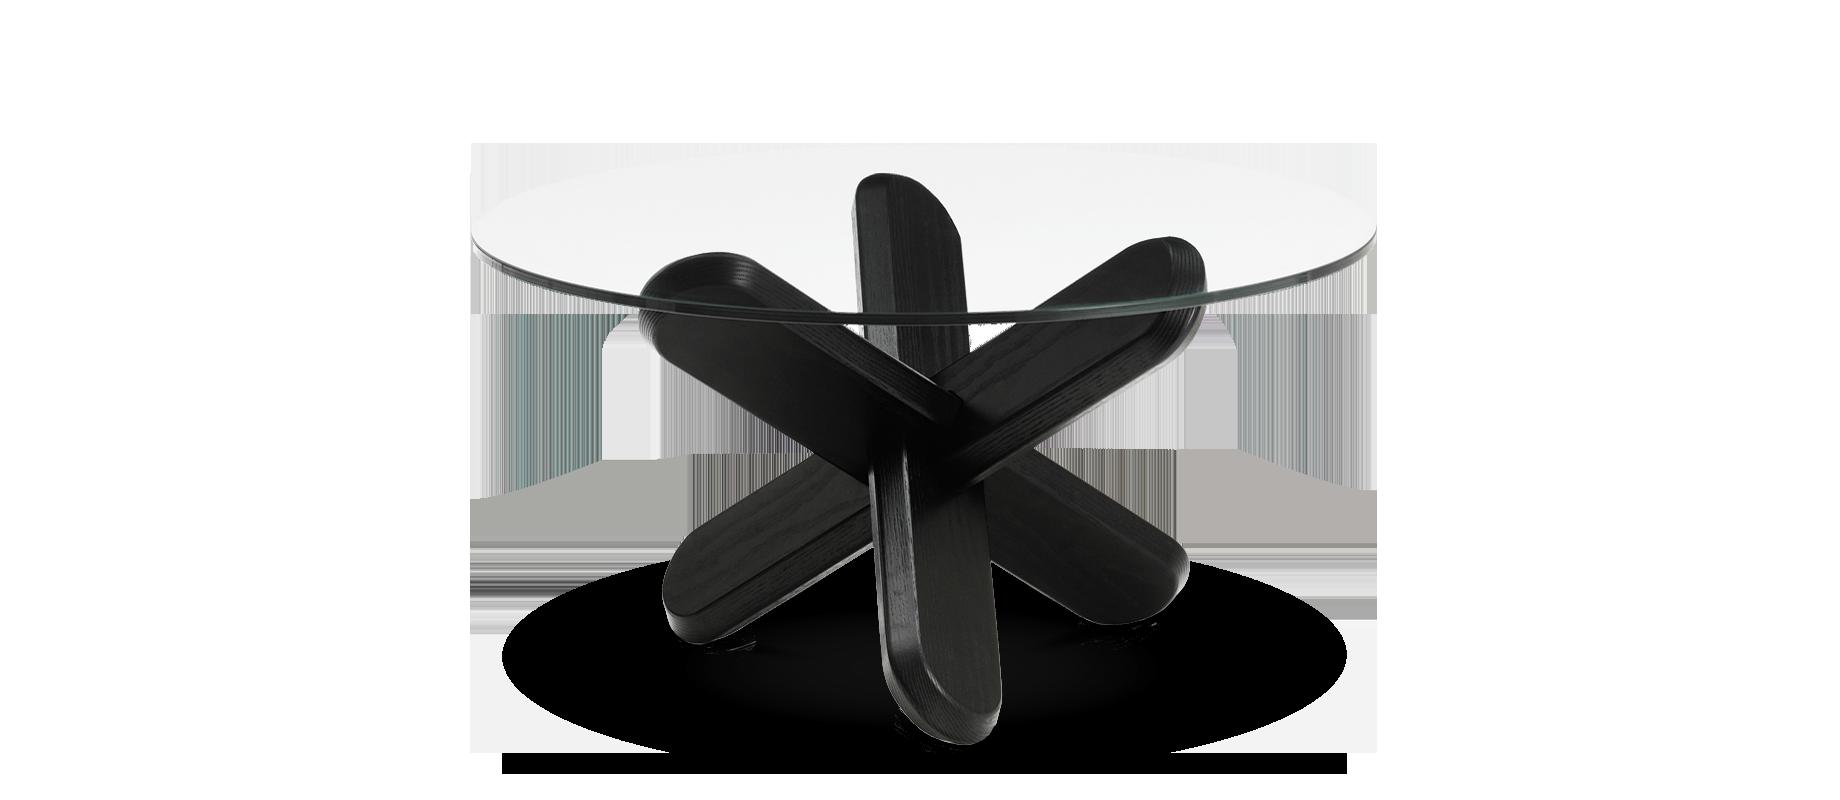 ding soffbord svart klarglas png (1840 u00d7800) Polyvore